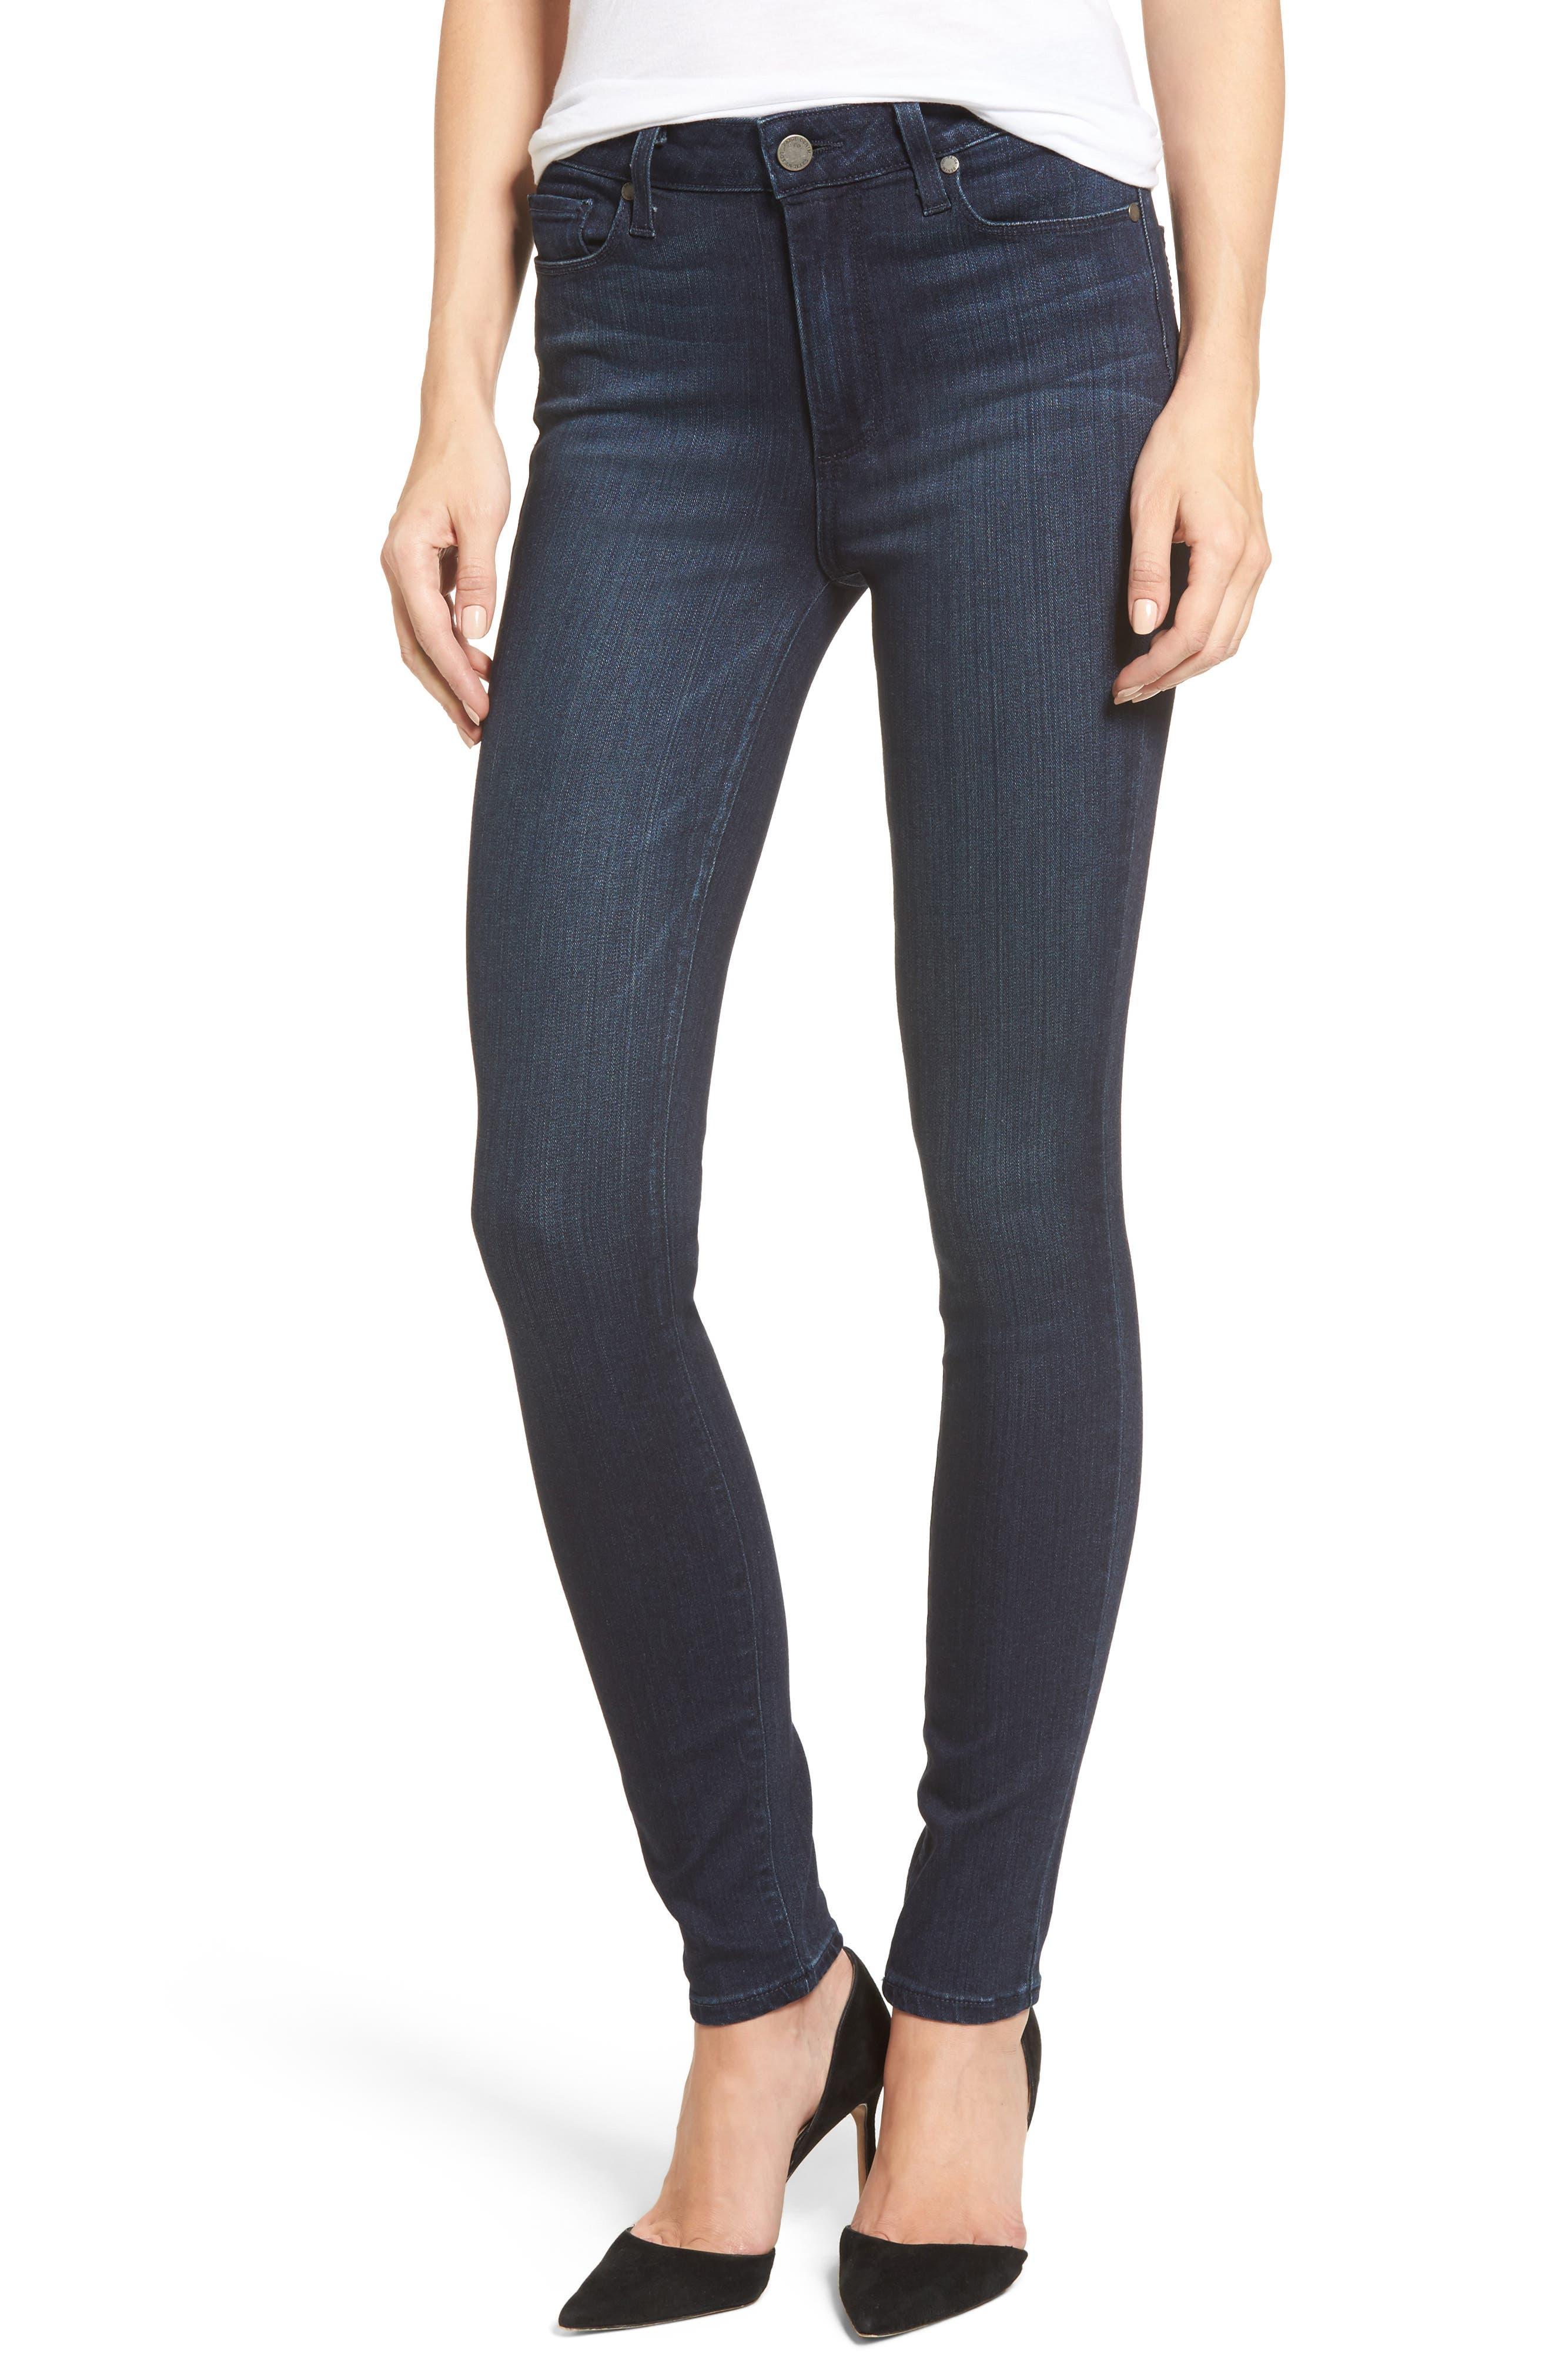 Transcend - Hoxton High Waist Ultra Skinny Jeans,                         Main,                         color, Midlake